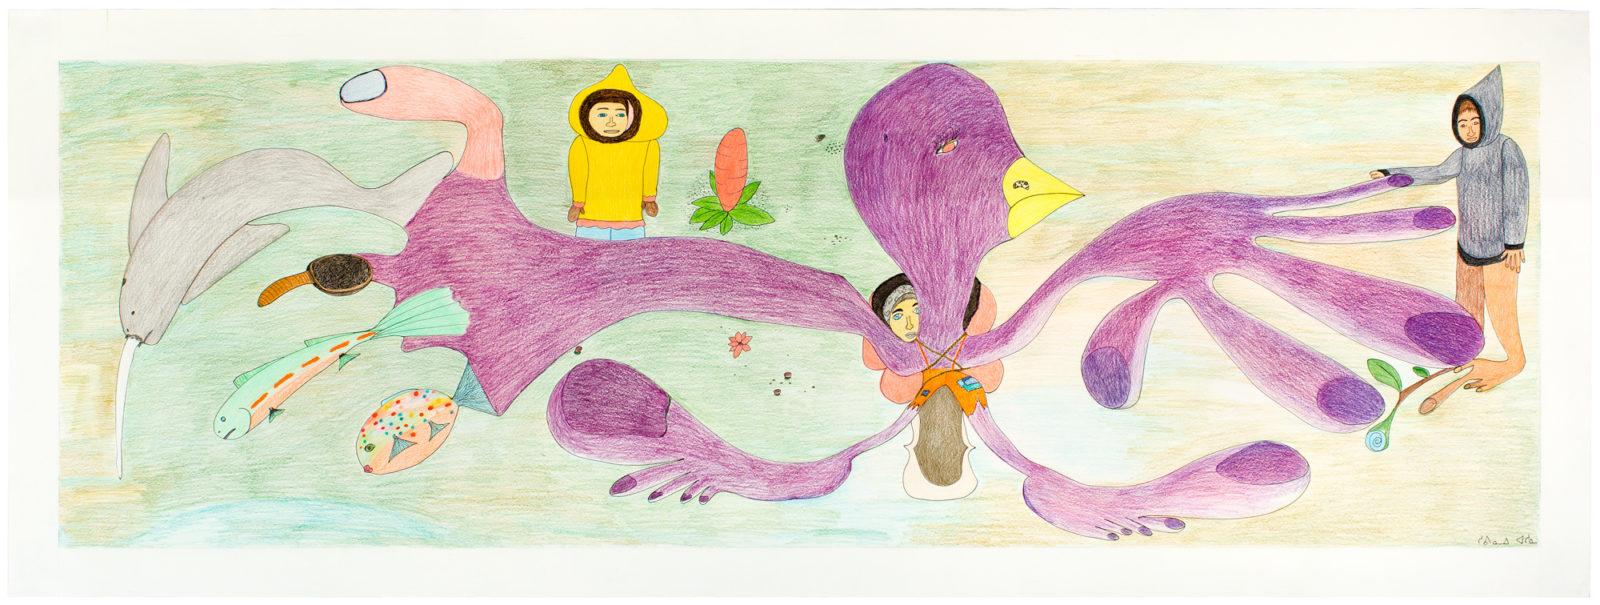 Shuvinai Ashoona - Composition (Purple Bird Transformation)